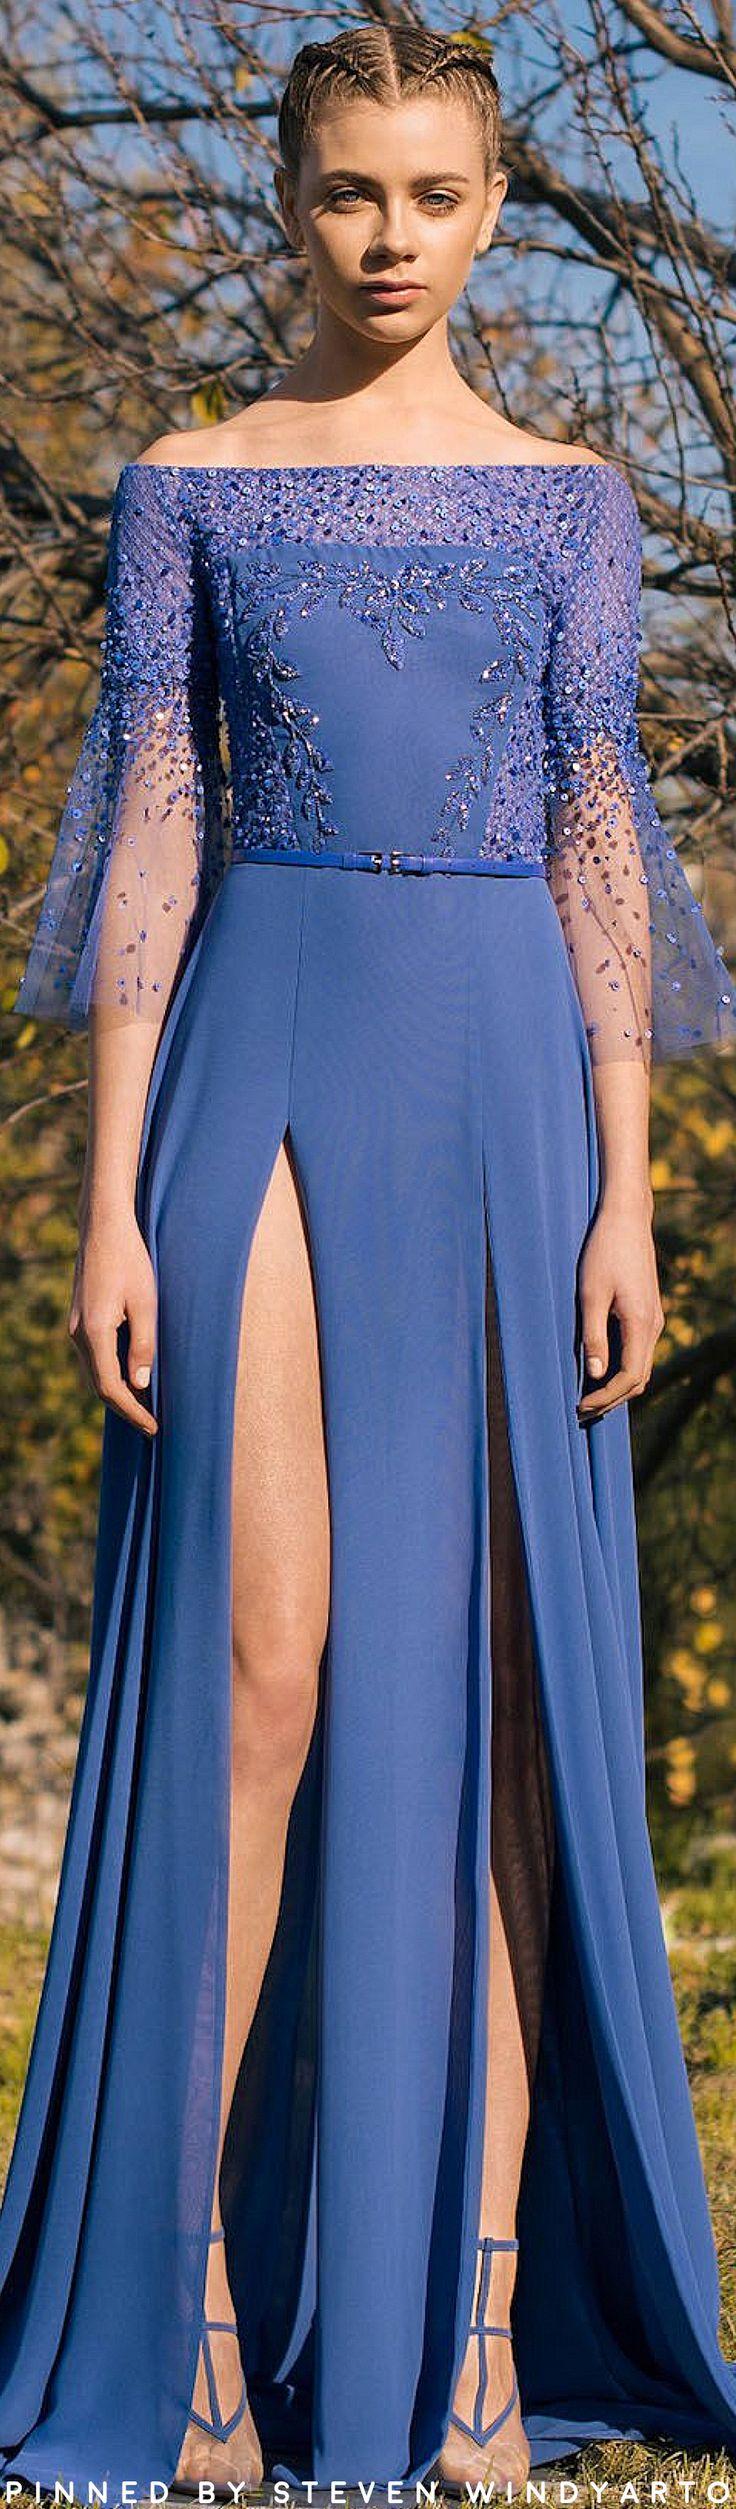 Georges Hobeika Pre Fall 2018 Lookbook #prefall2018 #pf18 #womenswear #georgeshobeika